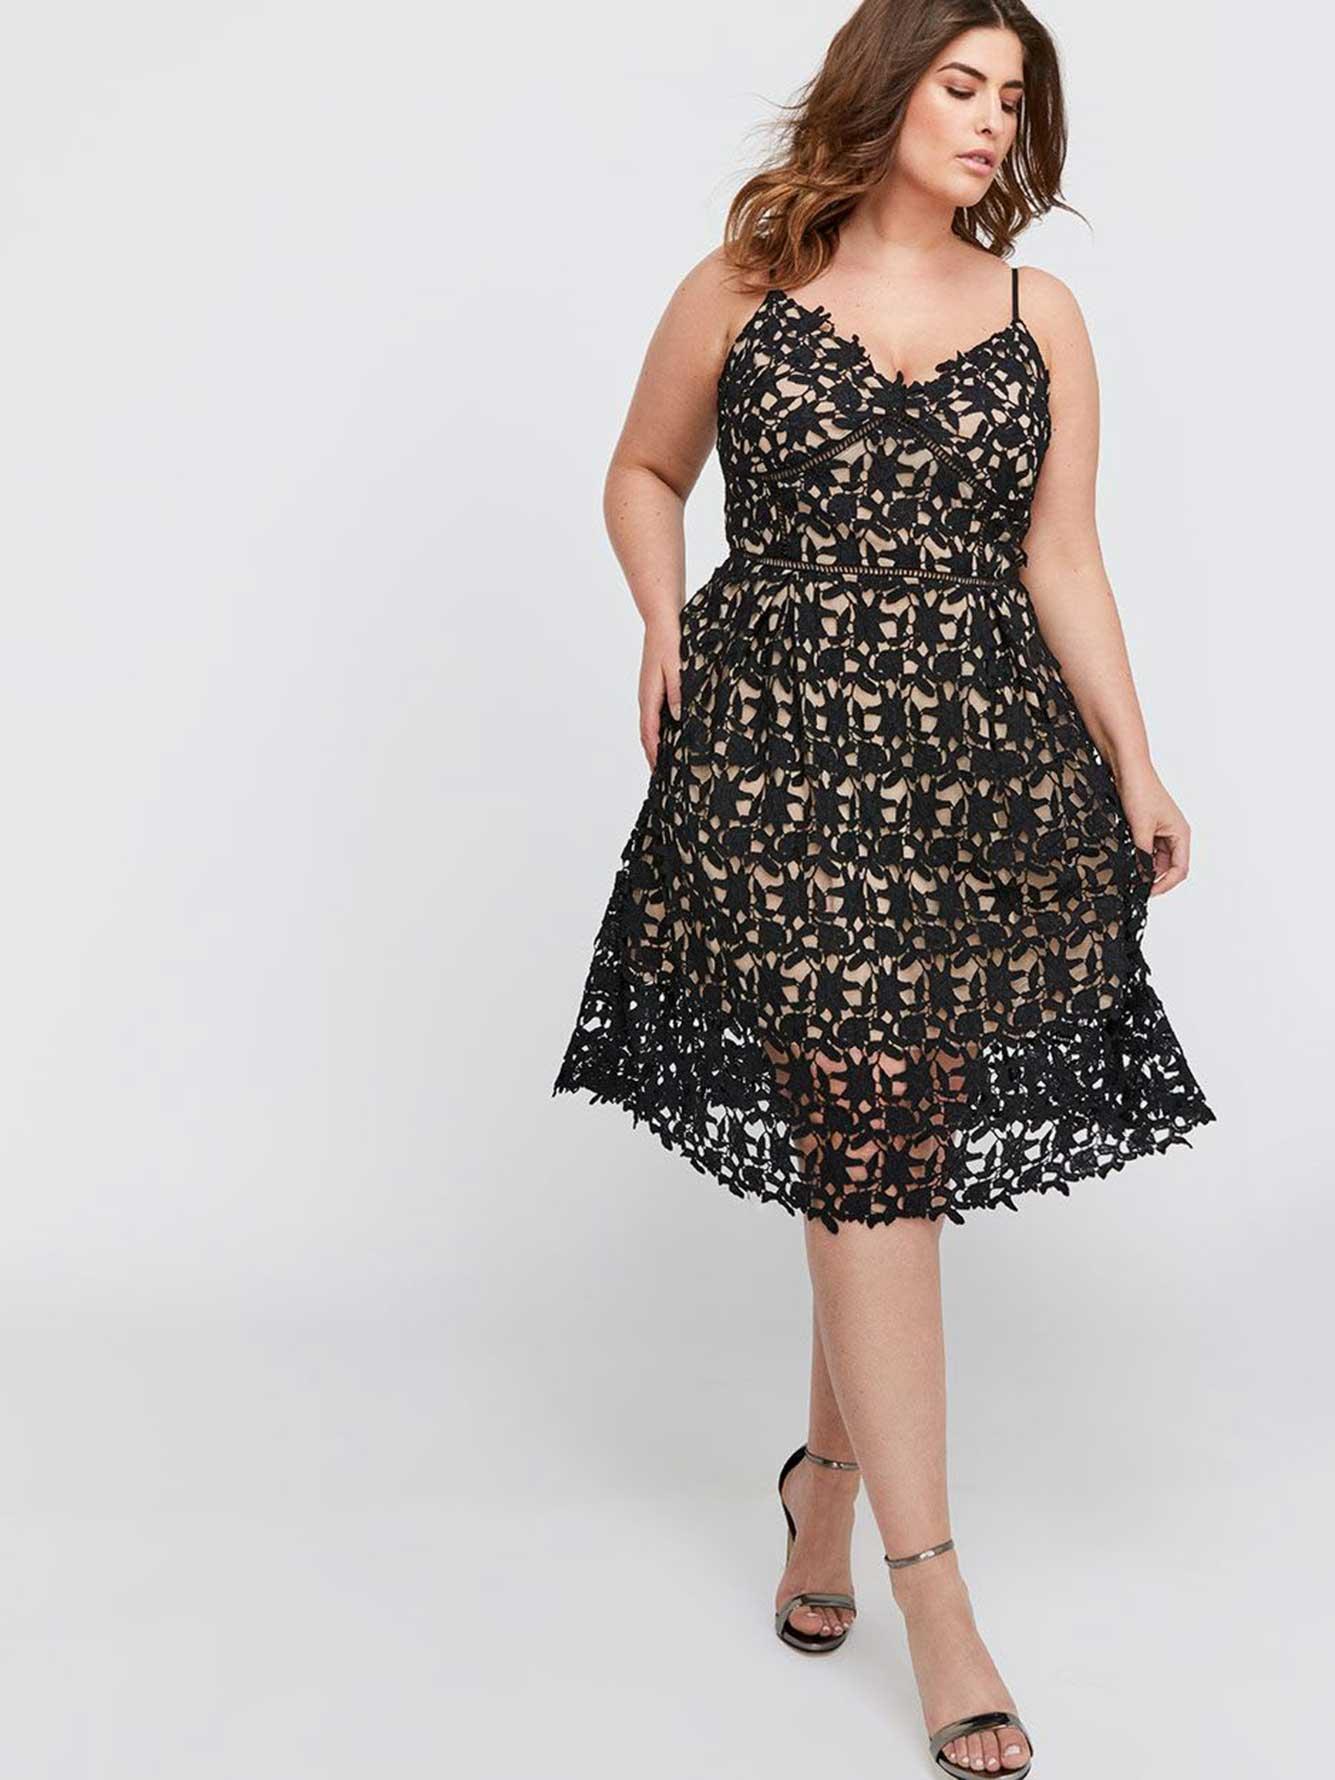 2bdeaab6cb City Chic Lace Dress